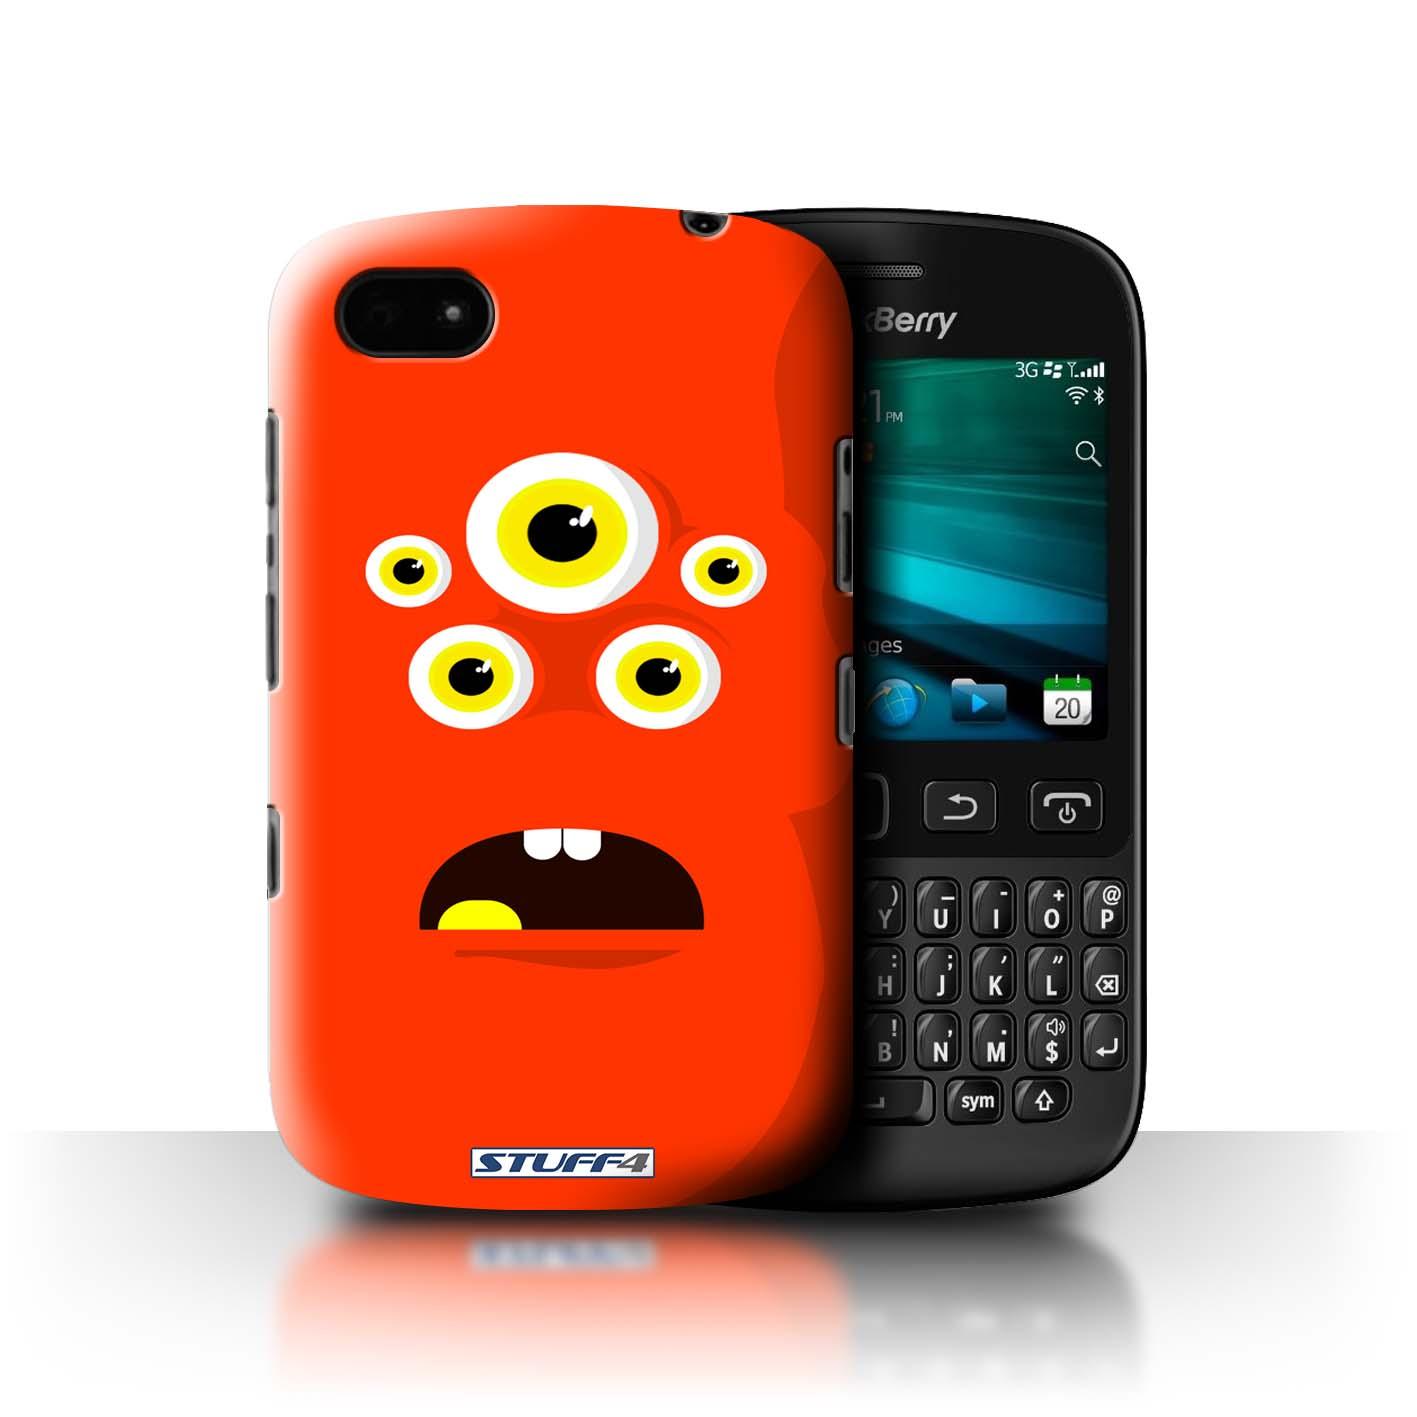 STUFF4-Coque-Etui-pour-Blackberry-Smartphone-Monstres-Protection-Housse